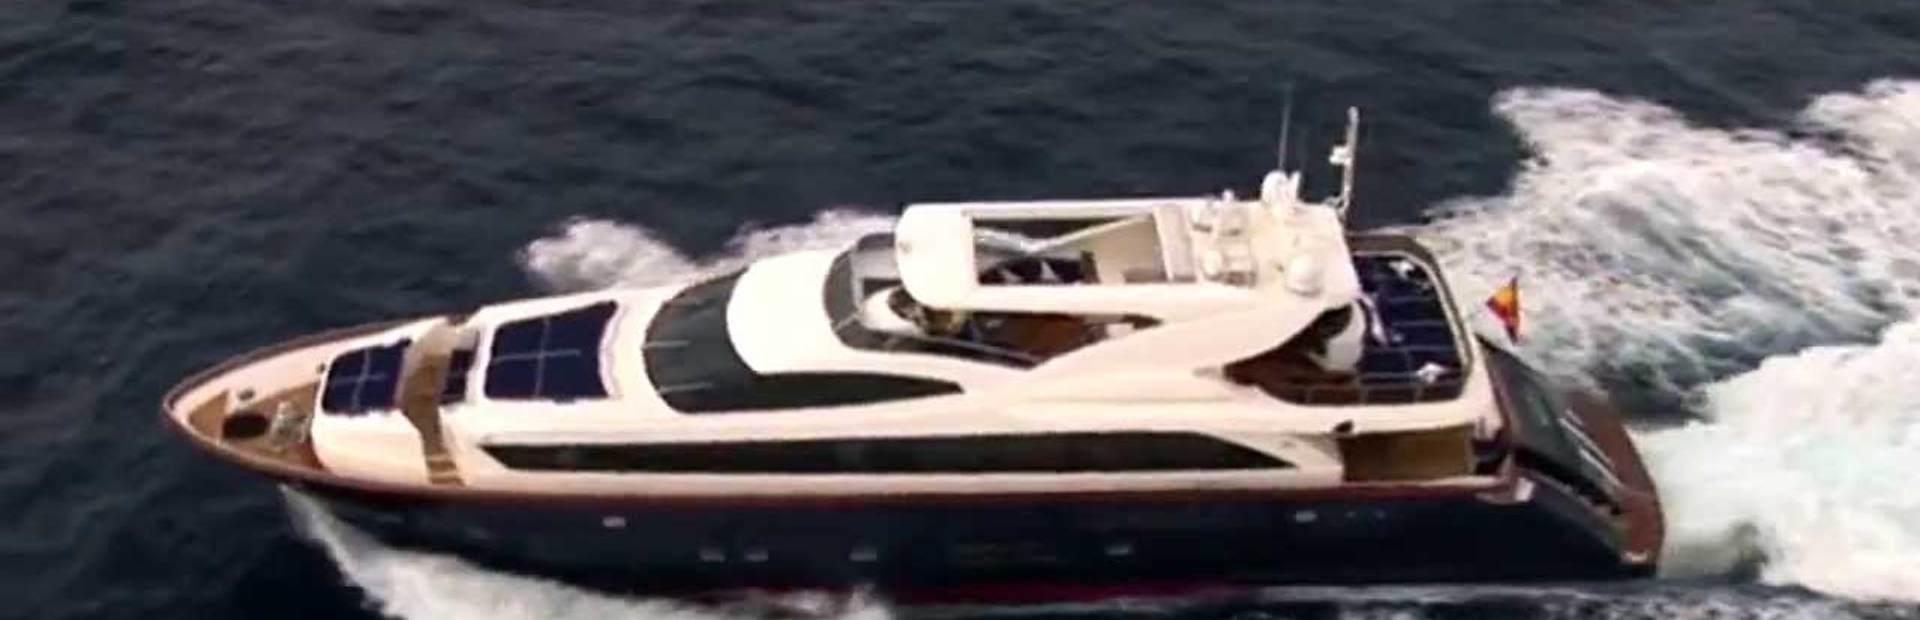 106 GLX Yacht Charter